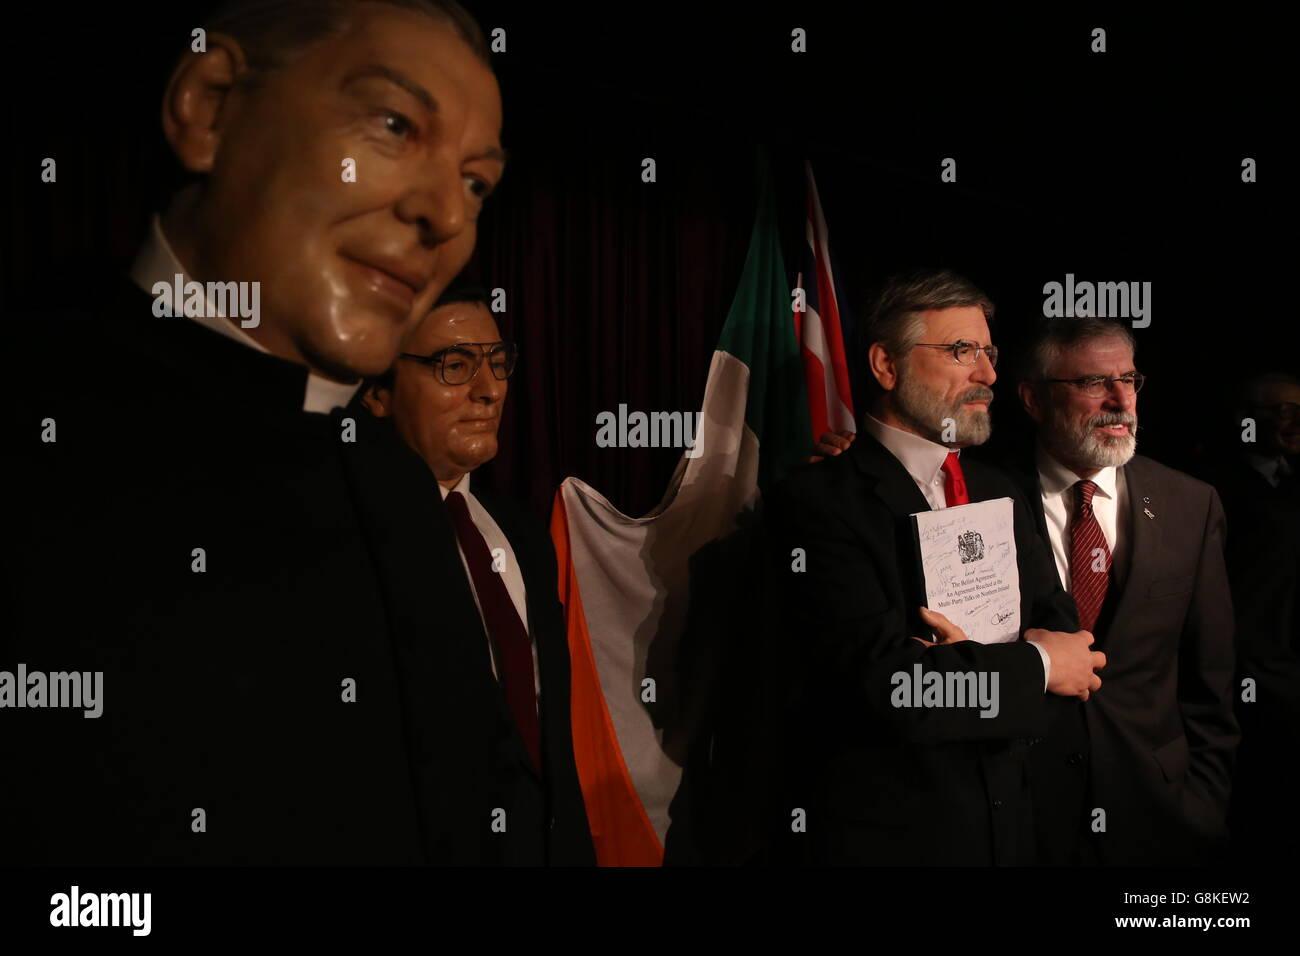 Gerry Adams waxwork - Dublin - Stock Image